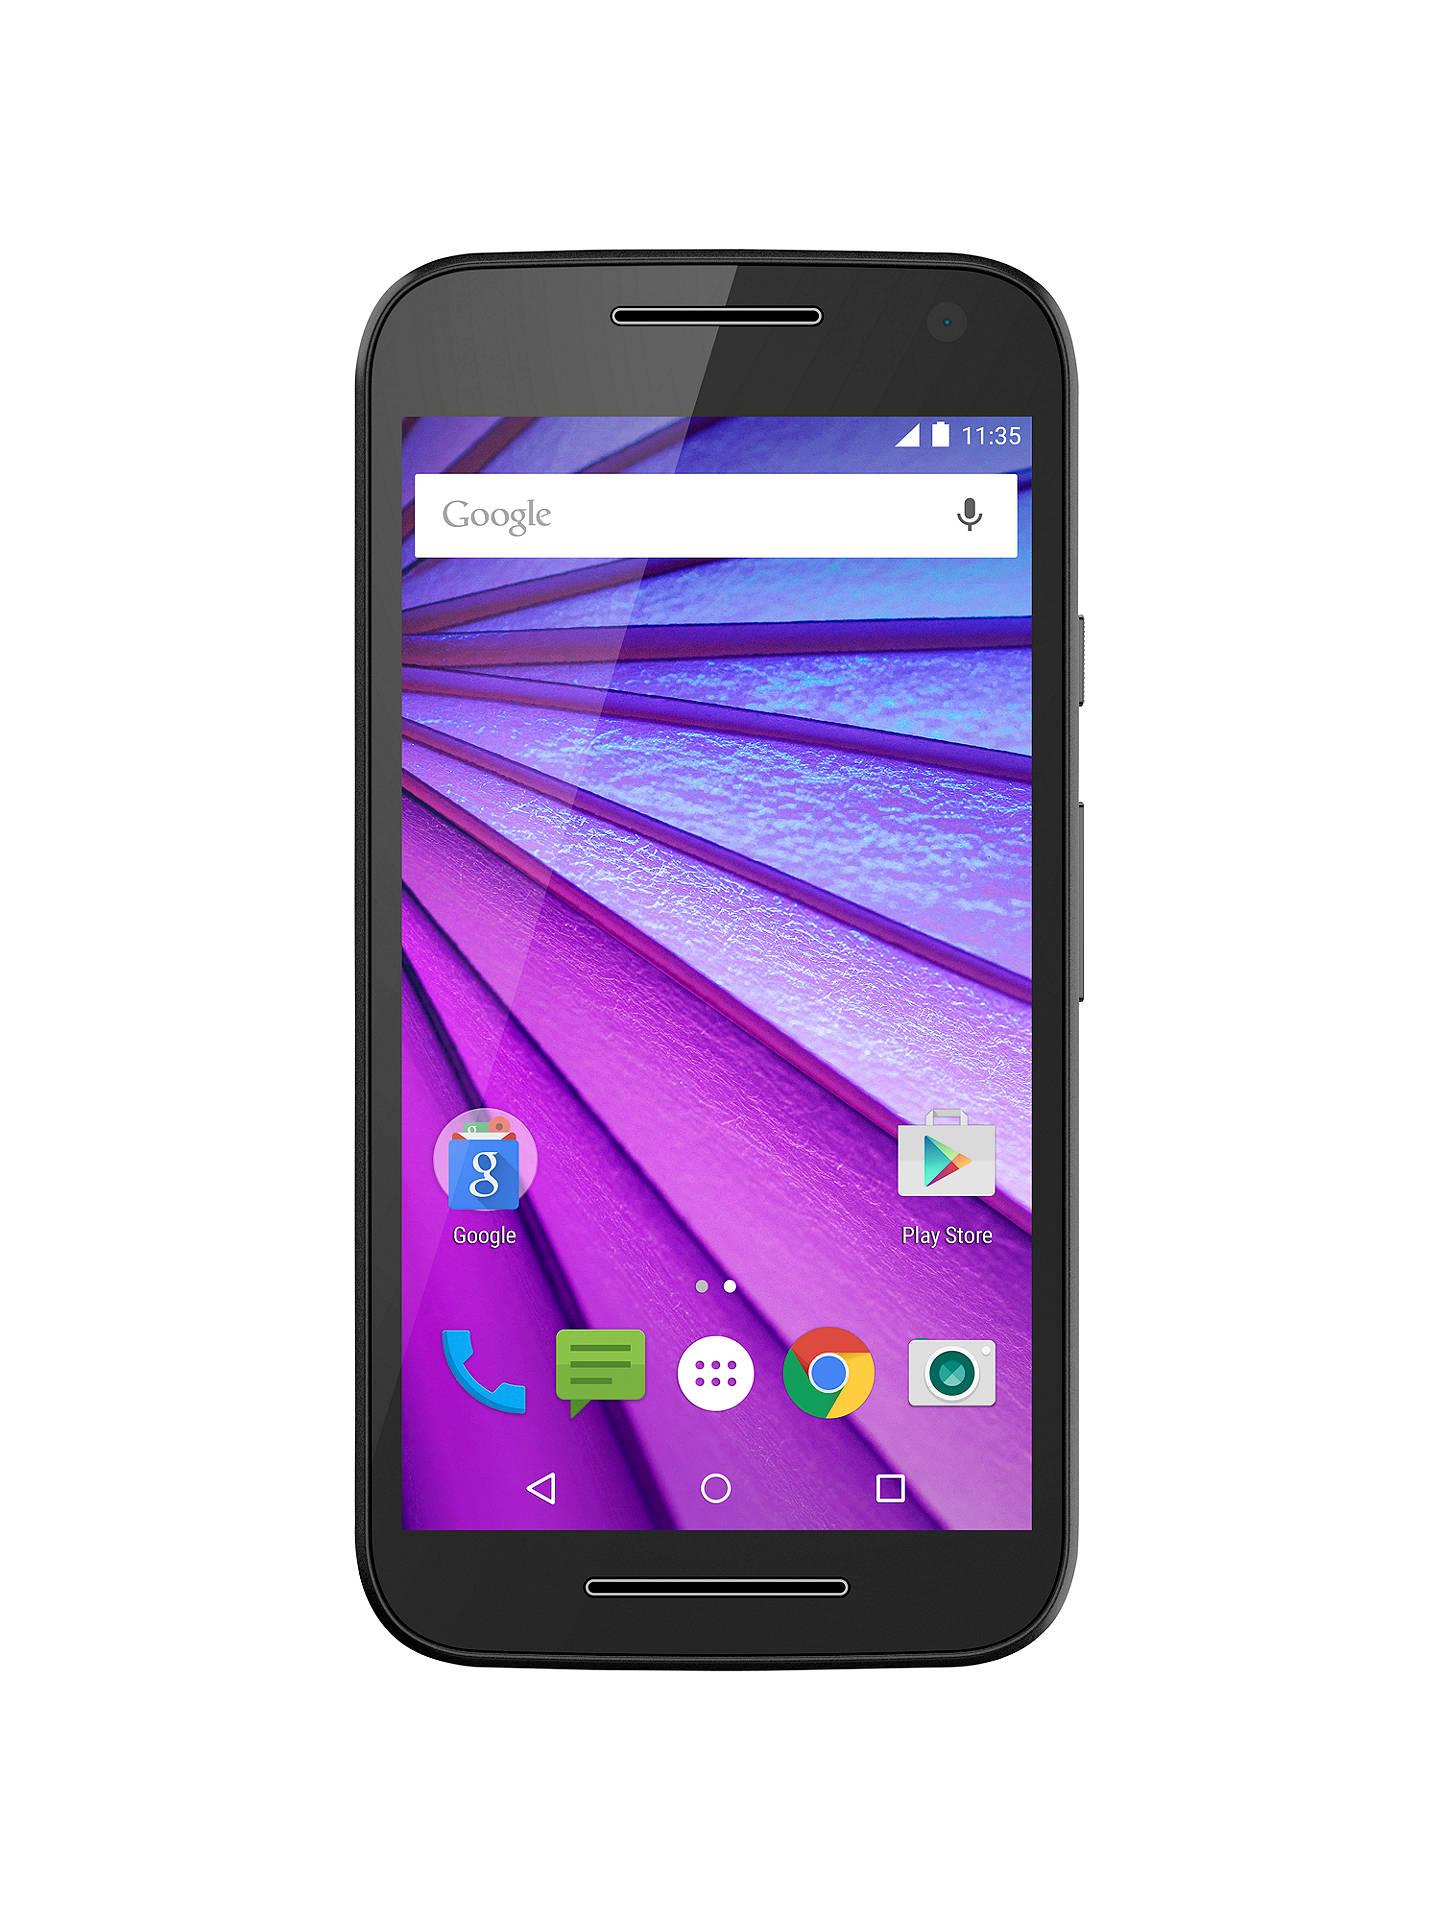 b699f8aca89 Motorola Moto G (3rd generation) Smartphone, Android, 5